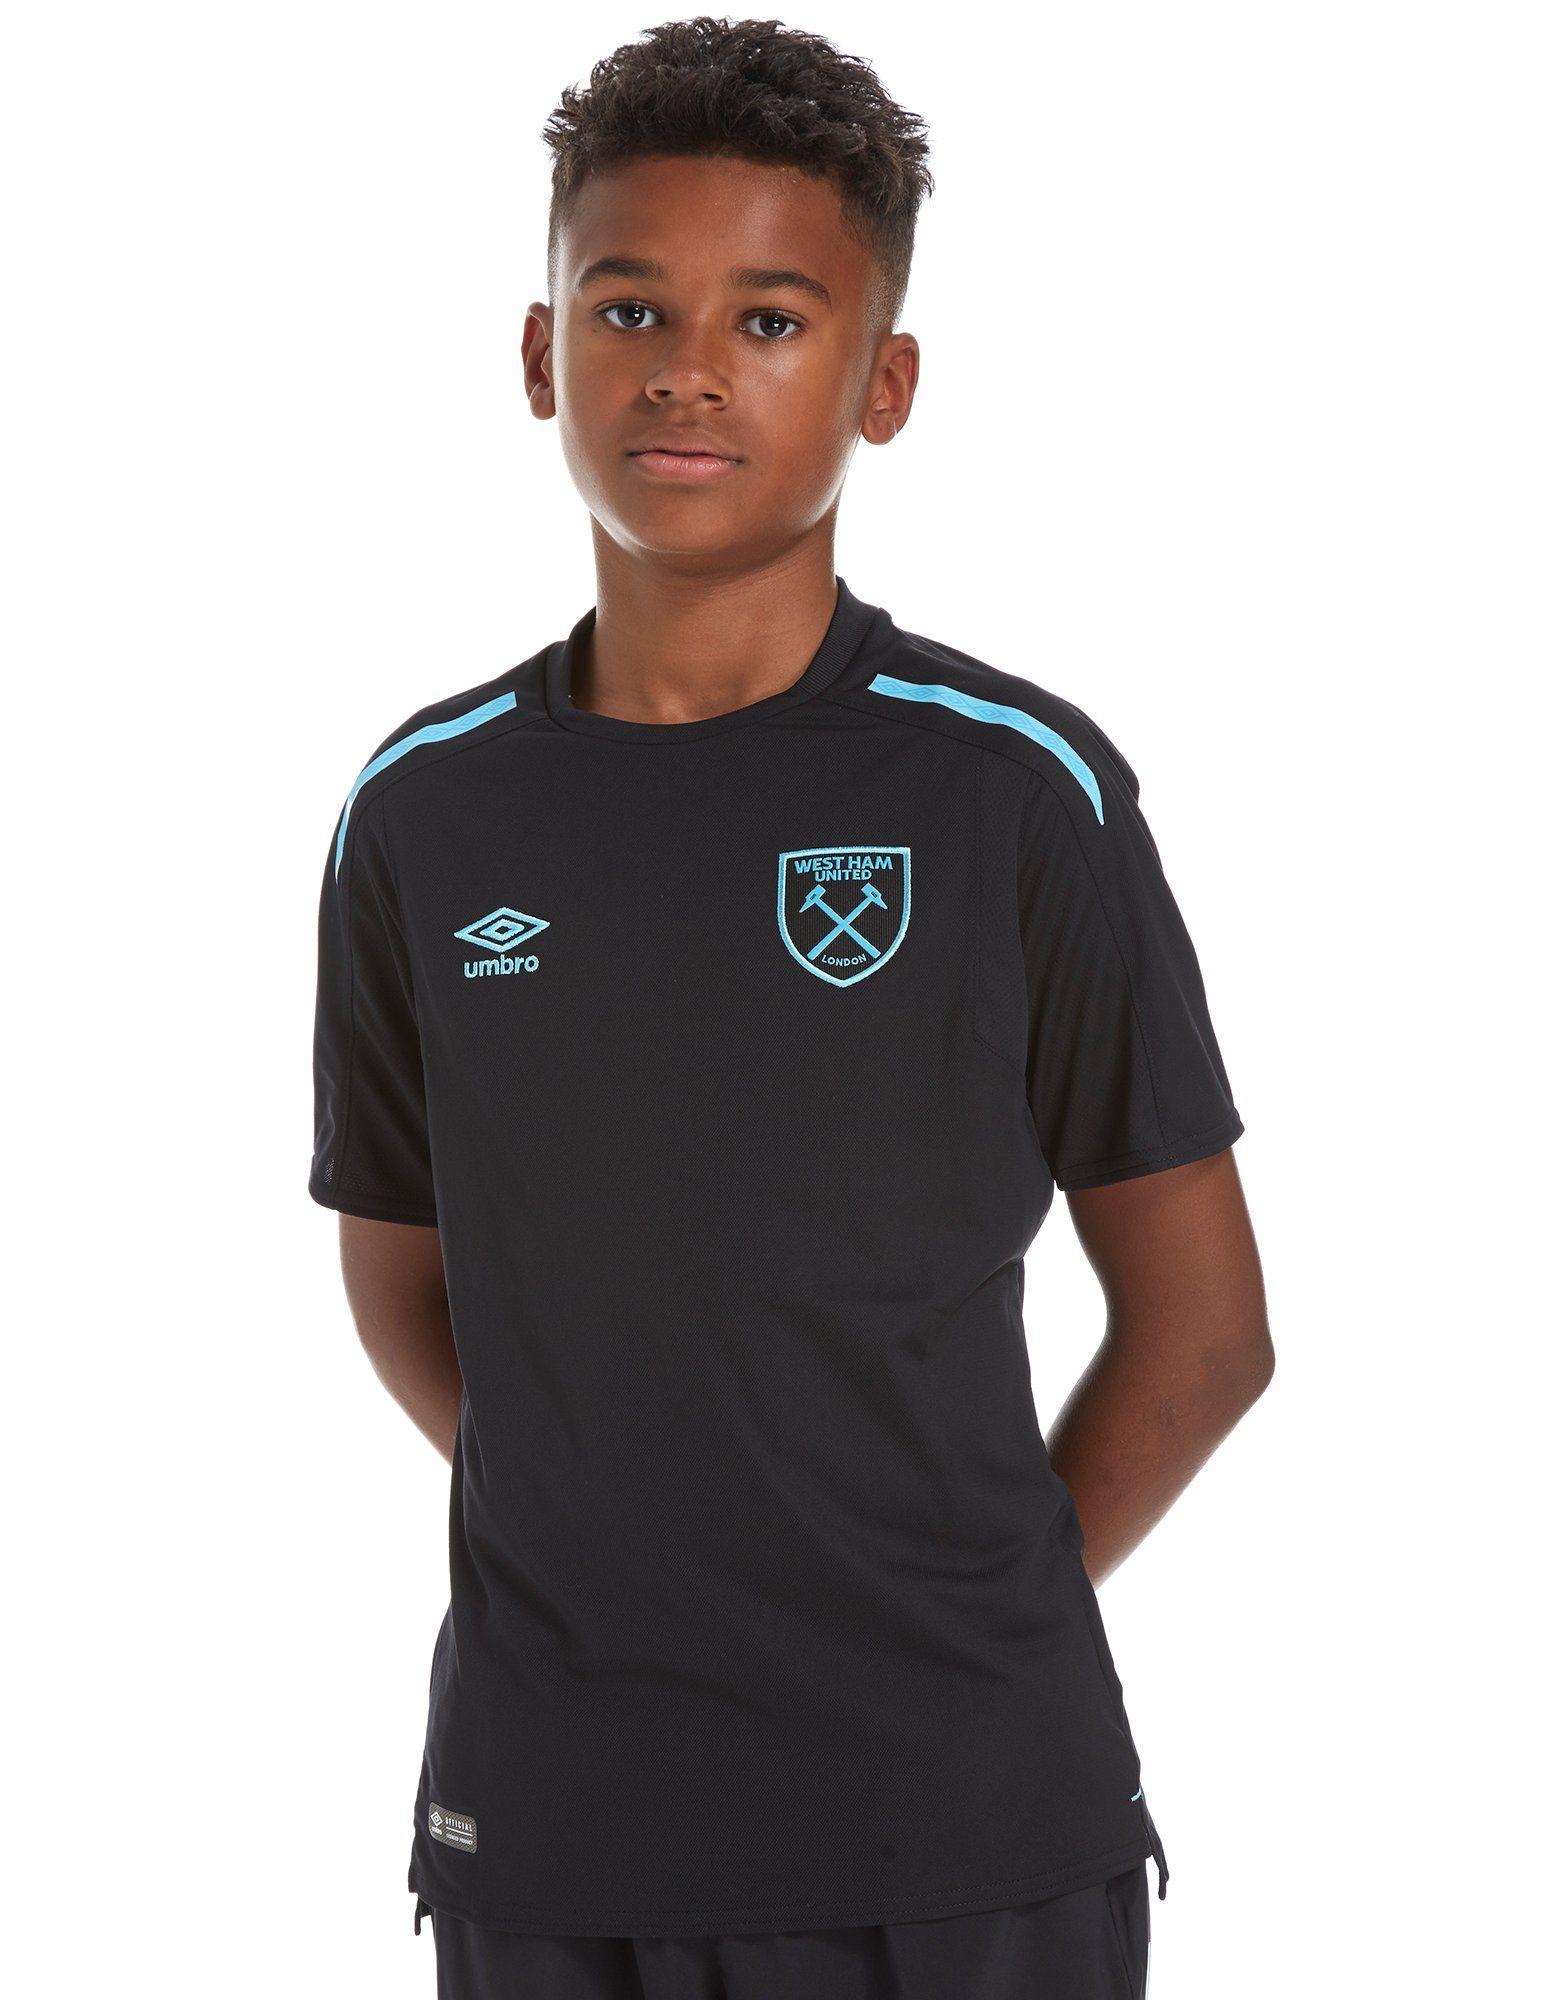 Umbro West Ham Utd 2017 18 Away Shirt Junior ... 9dab0ddff45